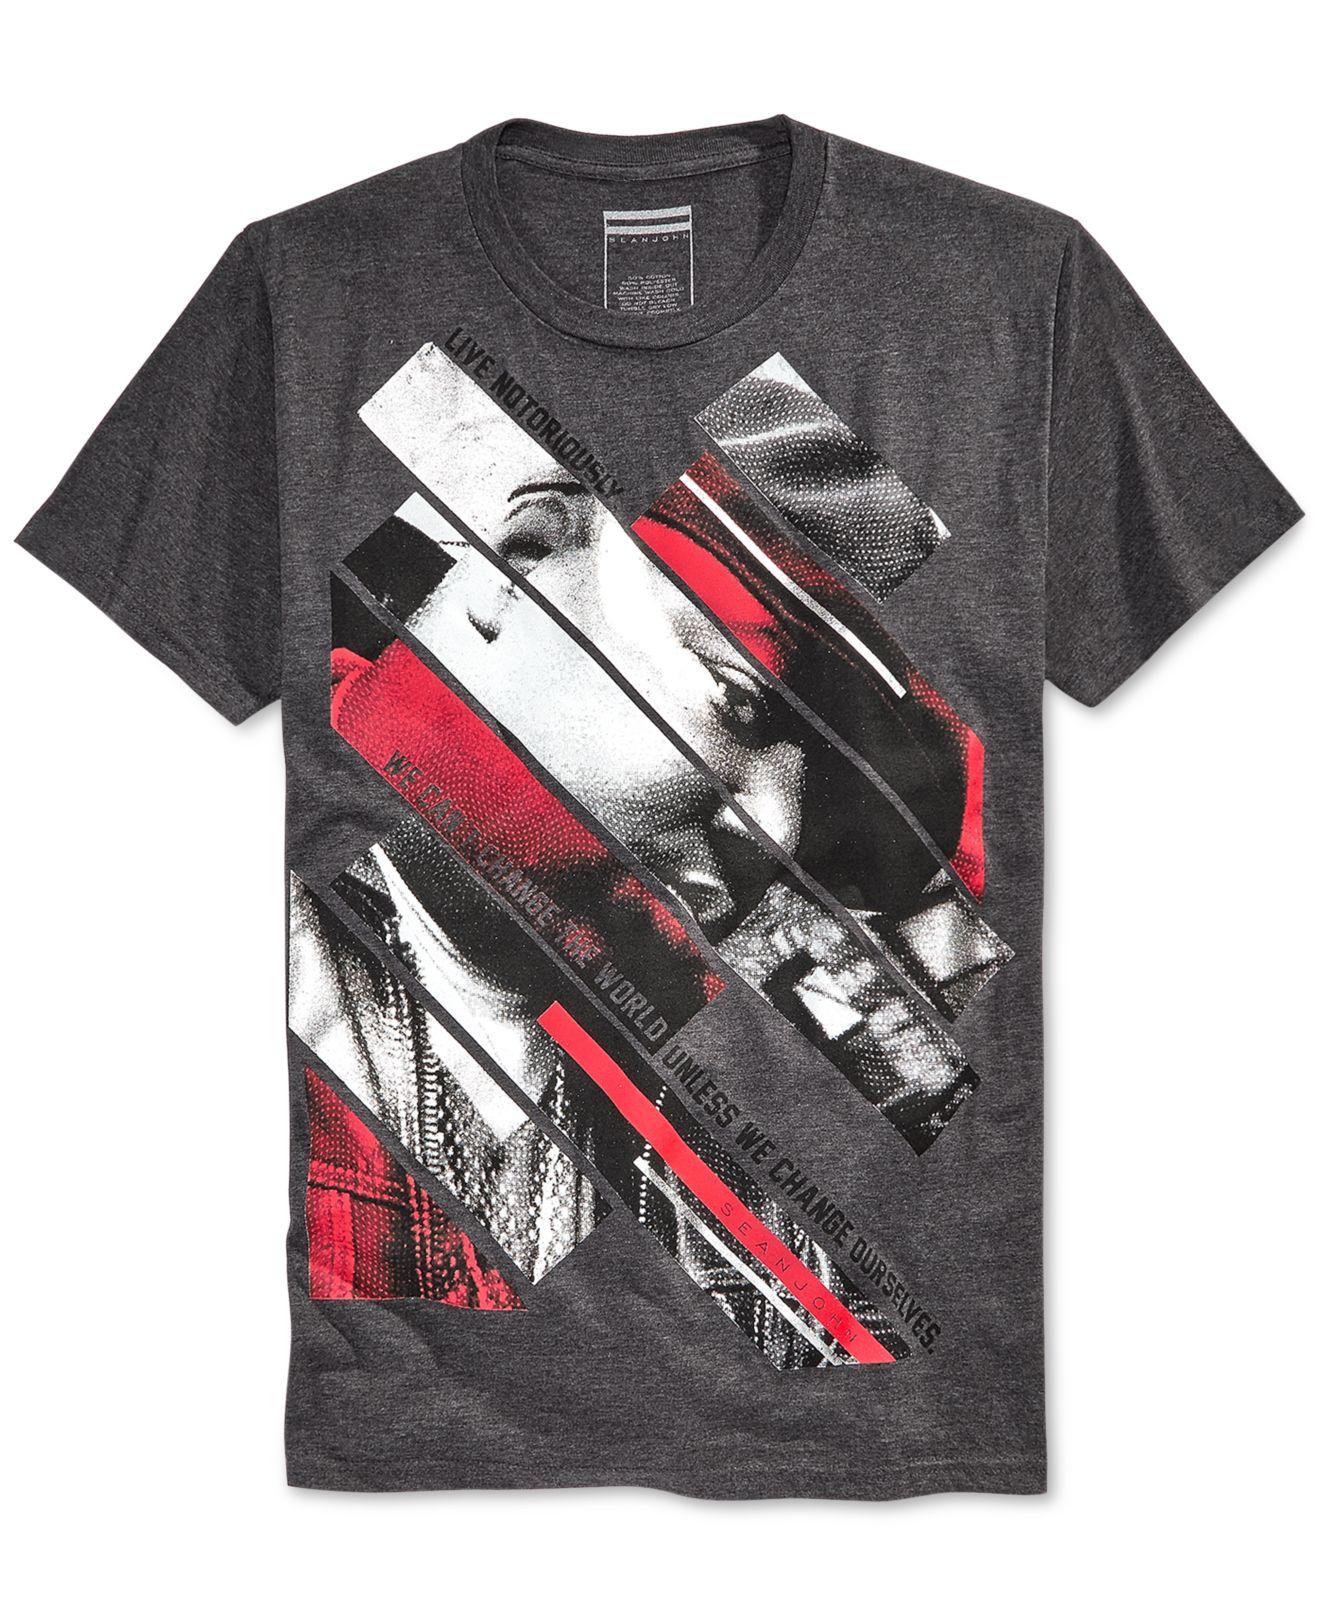 Sean john men 39 s big slashes t shirt in gray for men for Sean john t shirts for mens